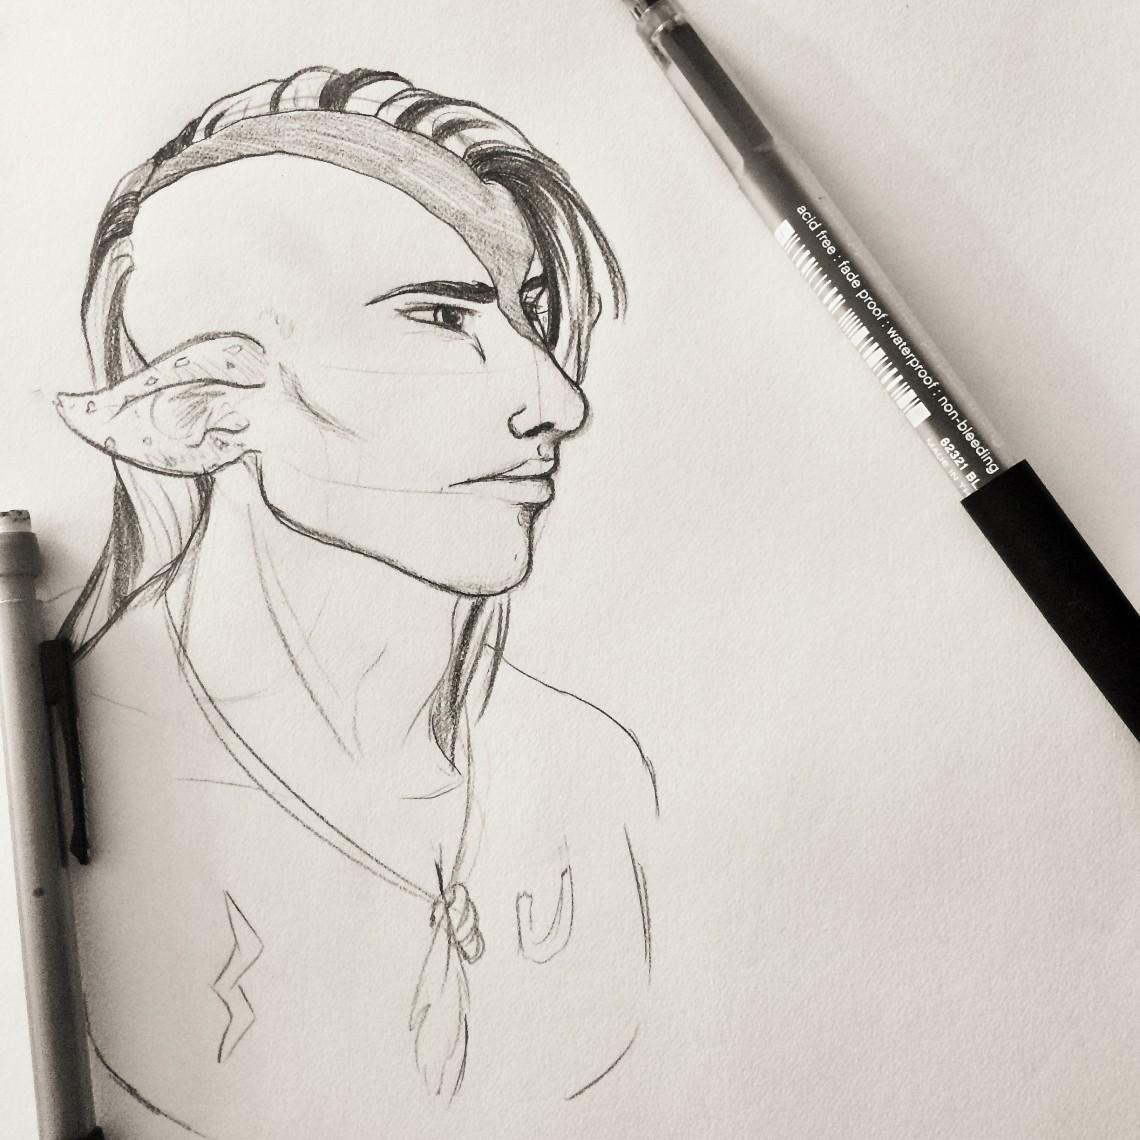 Tobiano Sketch Full